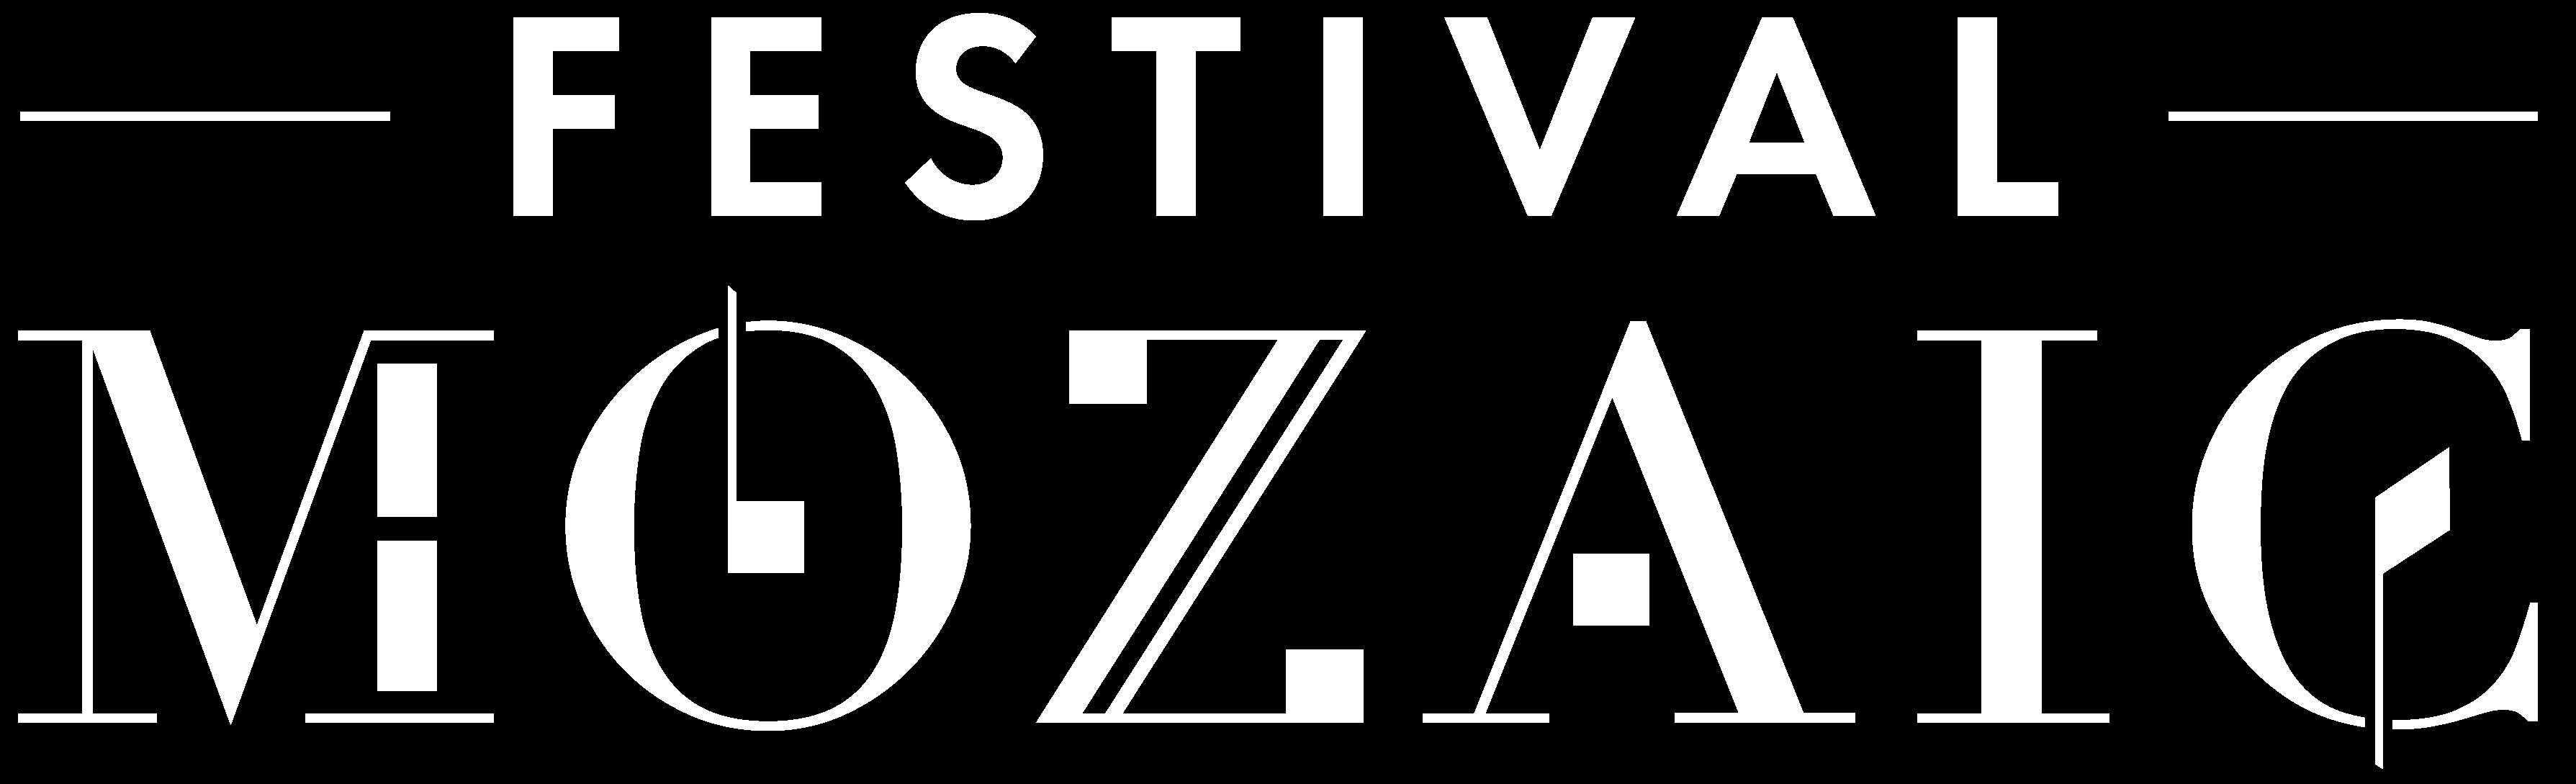 Festival Mozaic